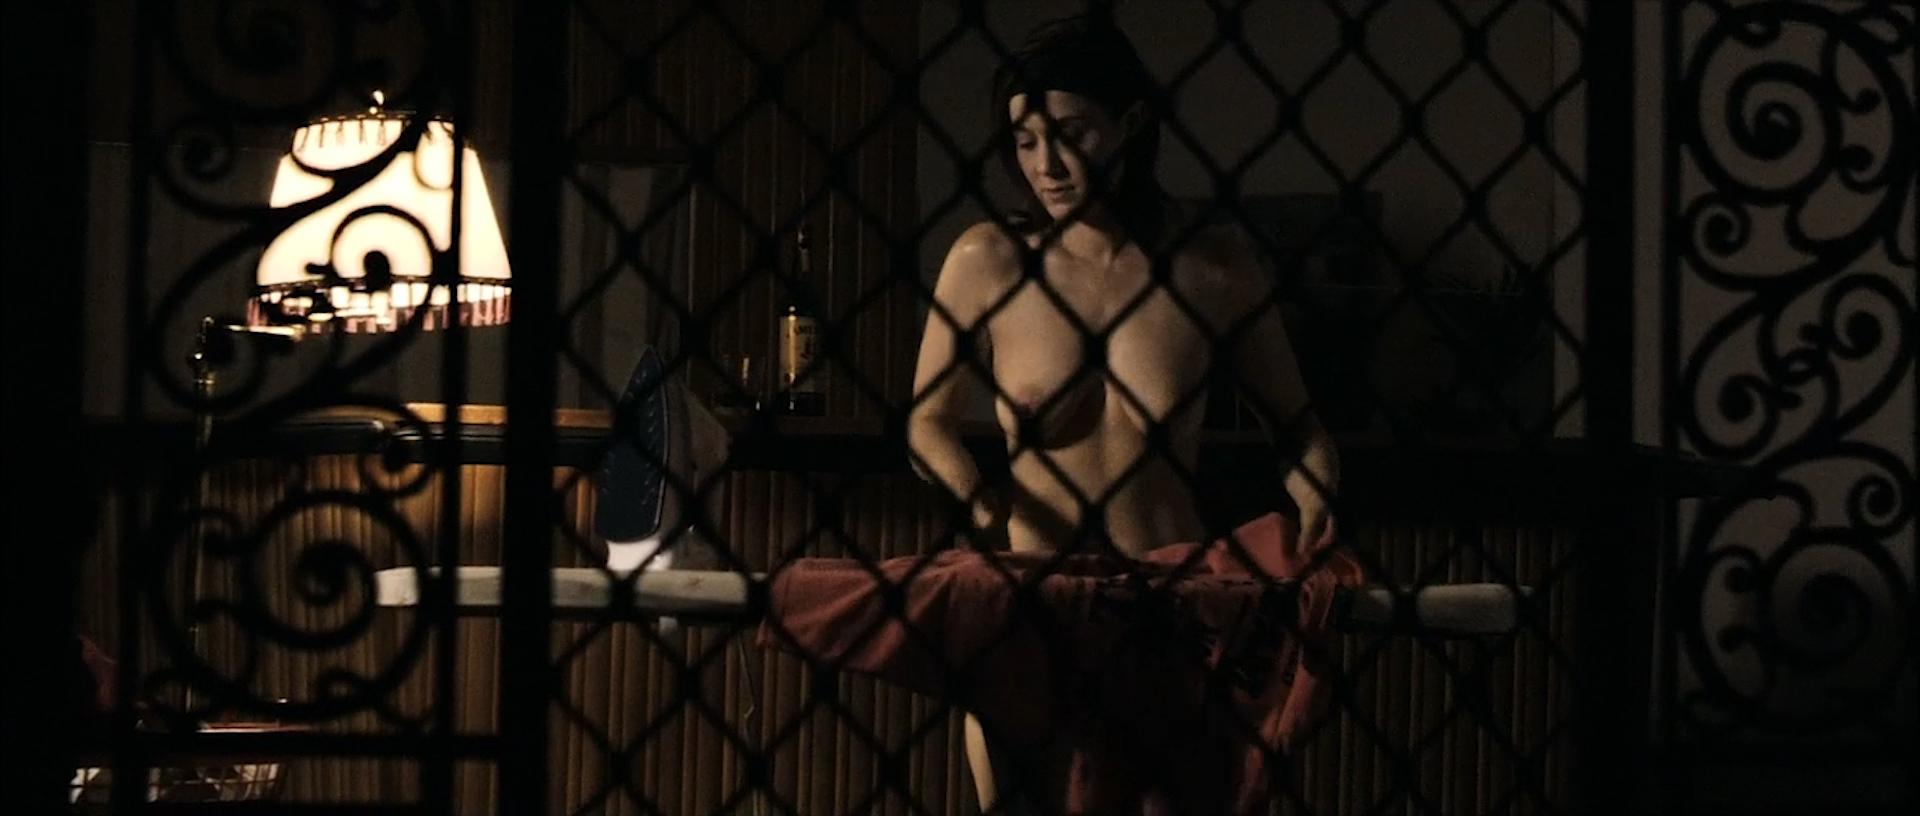 Tahyna Tozzi hot and wet and Kristi-Lee Kalendra nude topless - Beautiful (AU-2009) 1080p BluRay (5)